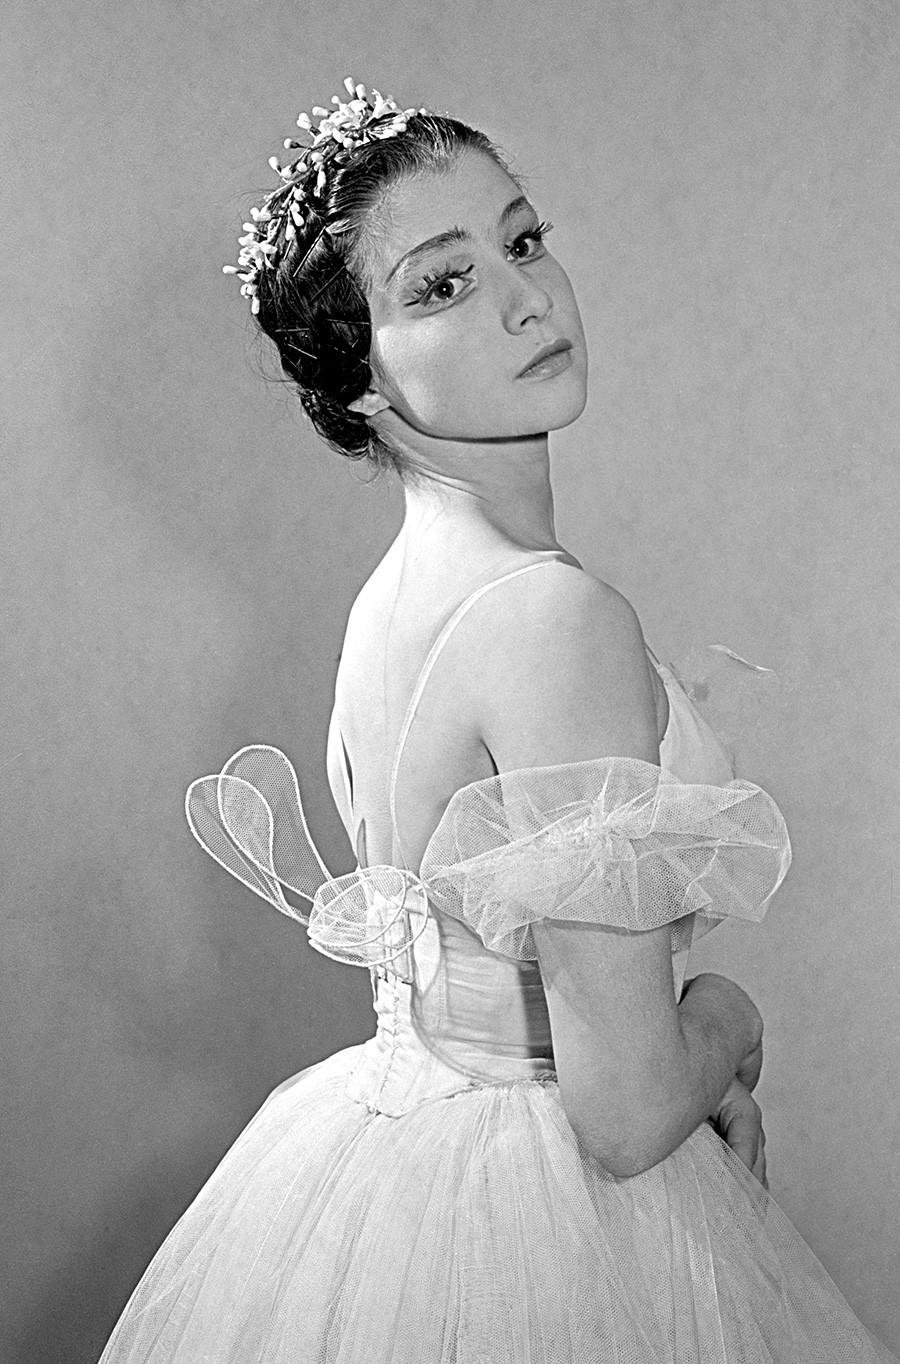 Jekaterina Maximowa im Jahr 1961.